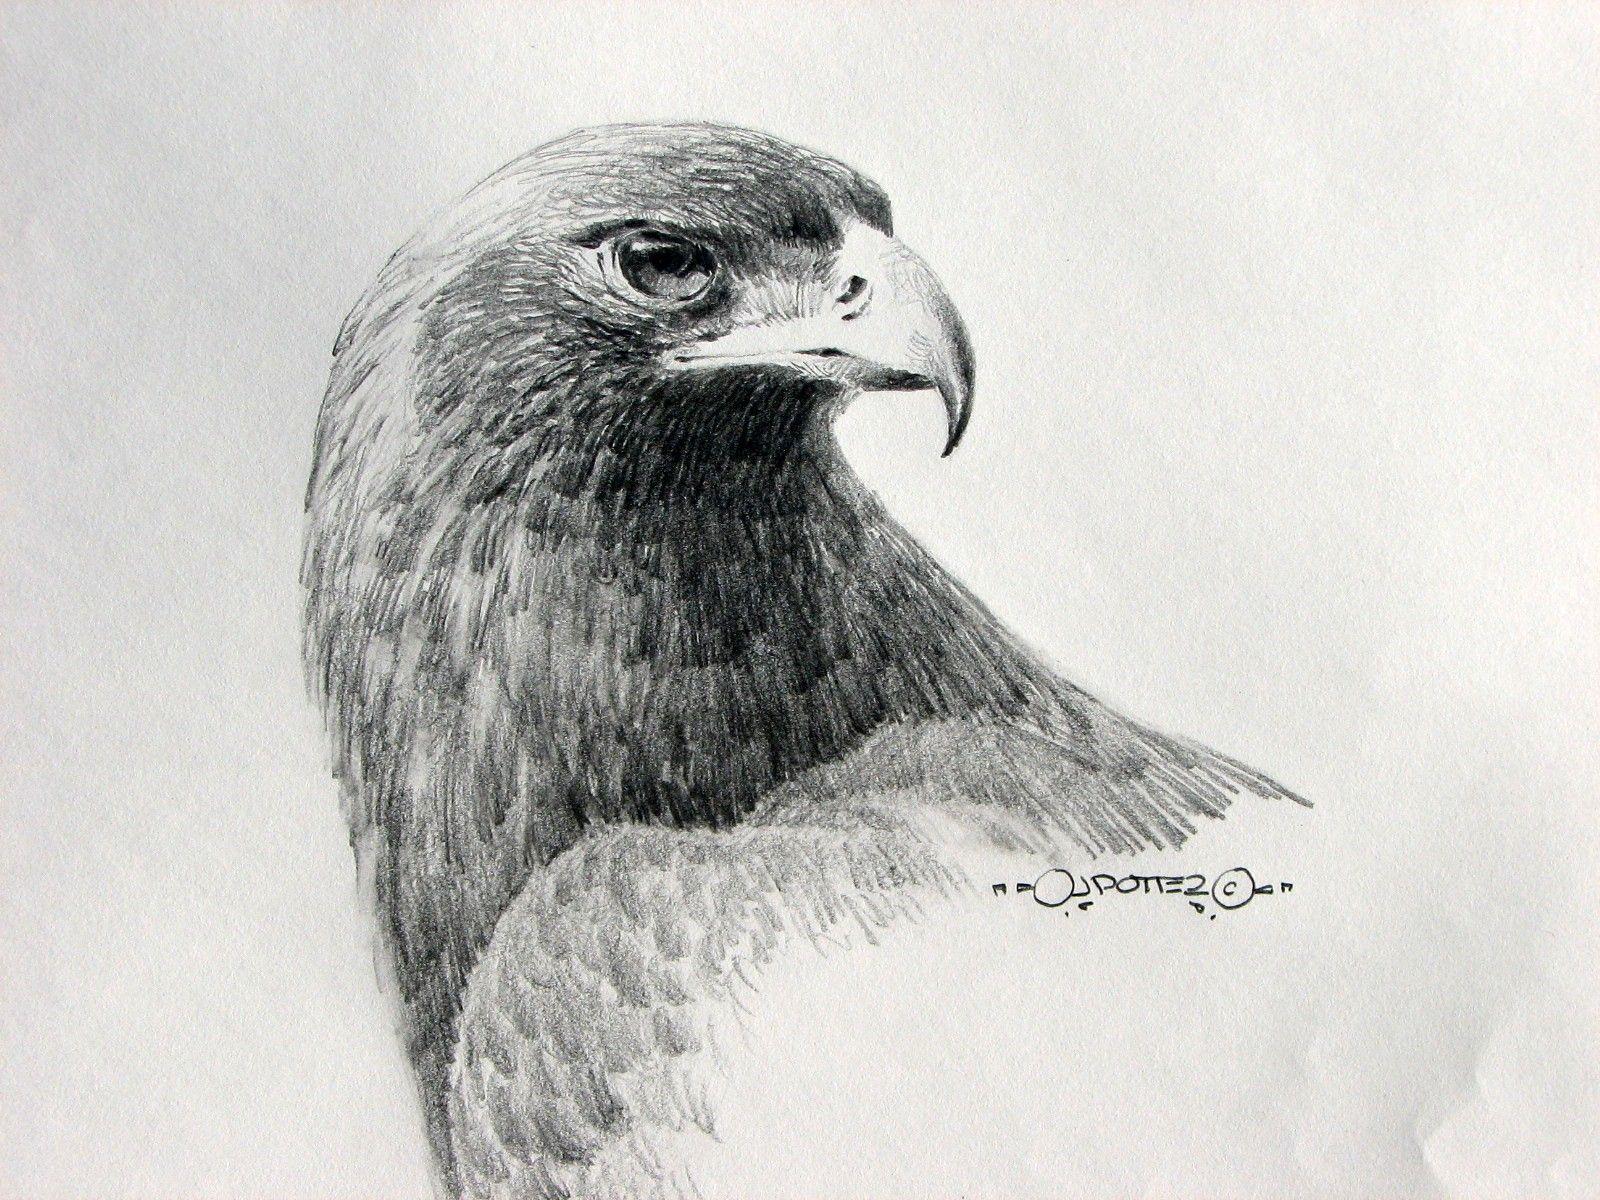 Eyeofthehunter Goldeneagle Jpg 1600 1200 Realistic Animal Drawings Eagle Drawing Eye Drawing